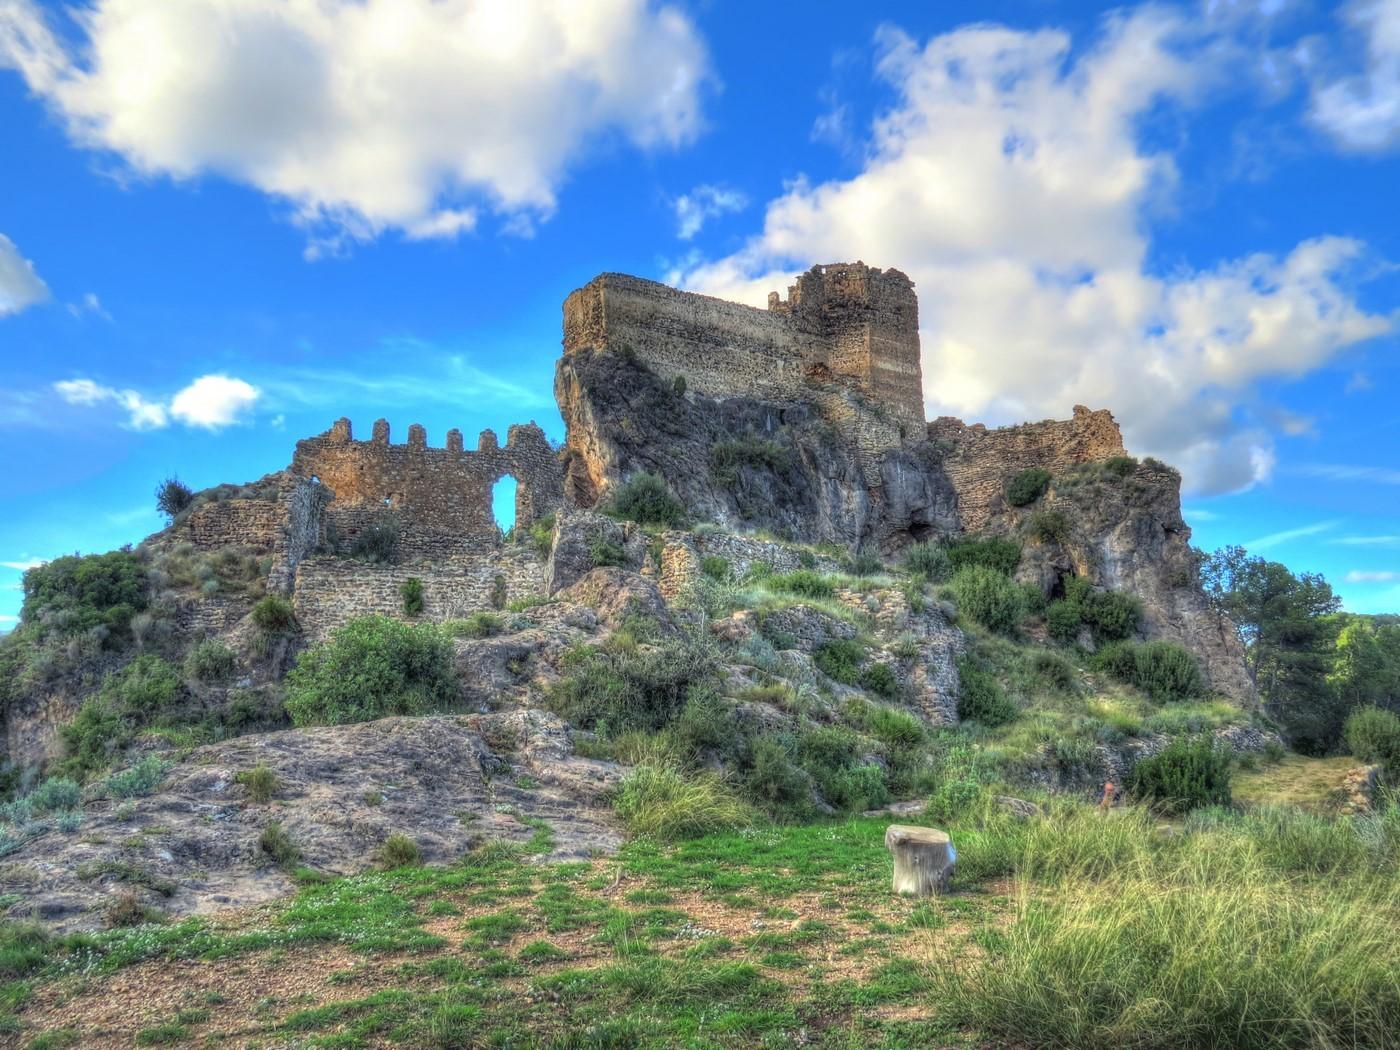 castillo de Mauz - sueras